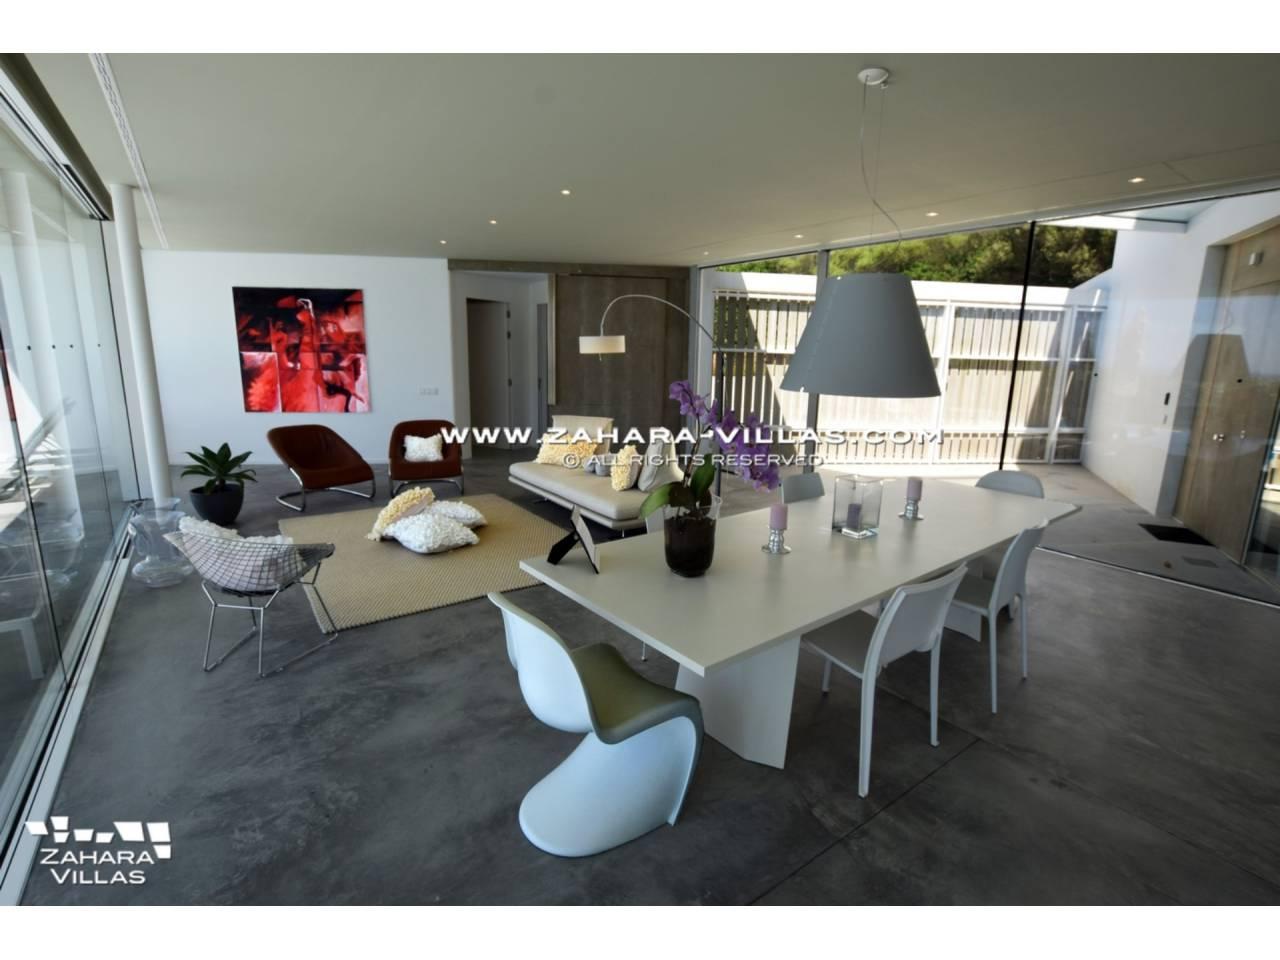 Imagen 4 de Villa zum verkauf in Atlanterra